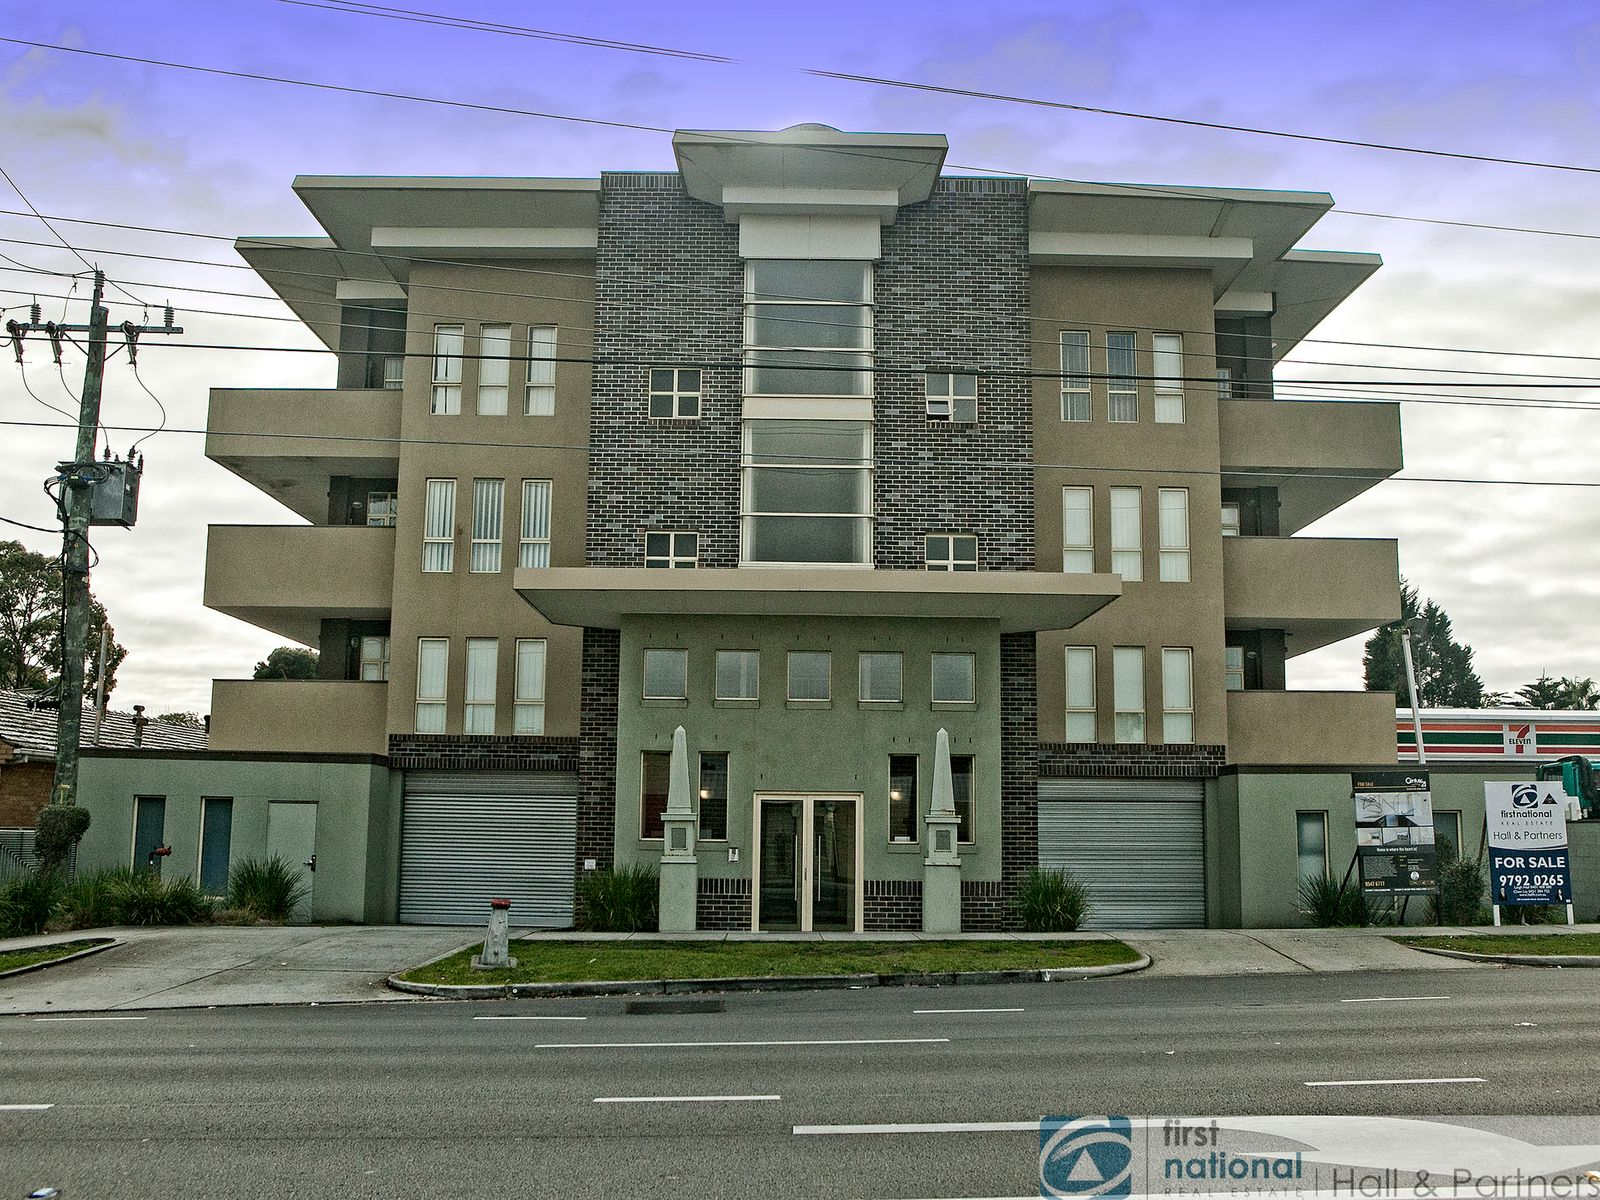 16/61-63 Clow Street, Dandenong, VIC 3175